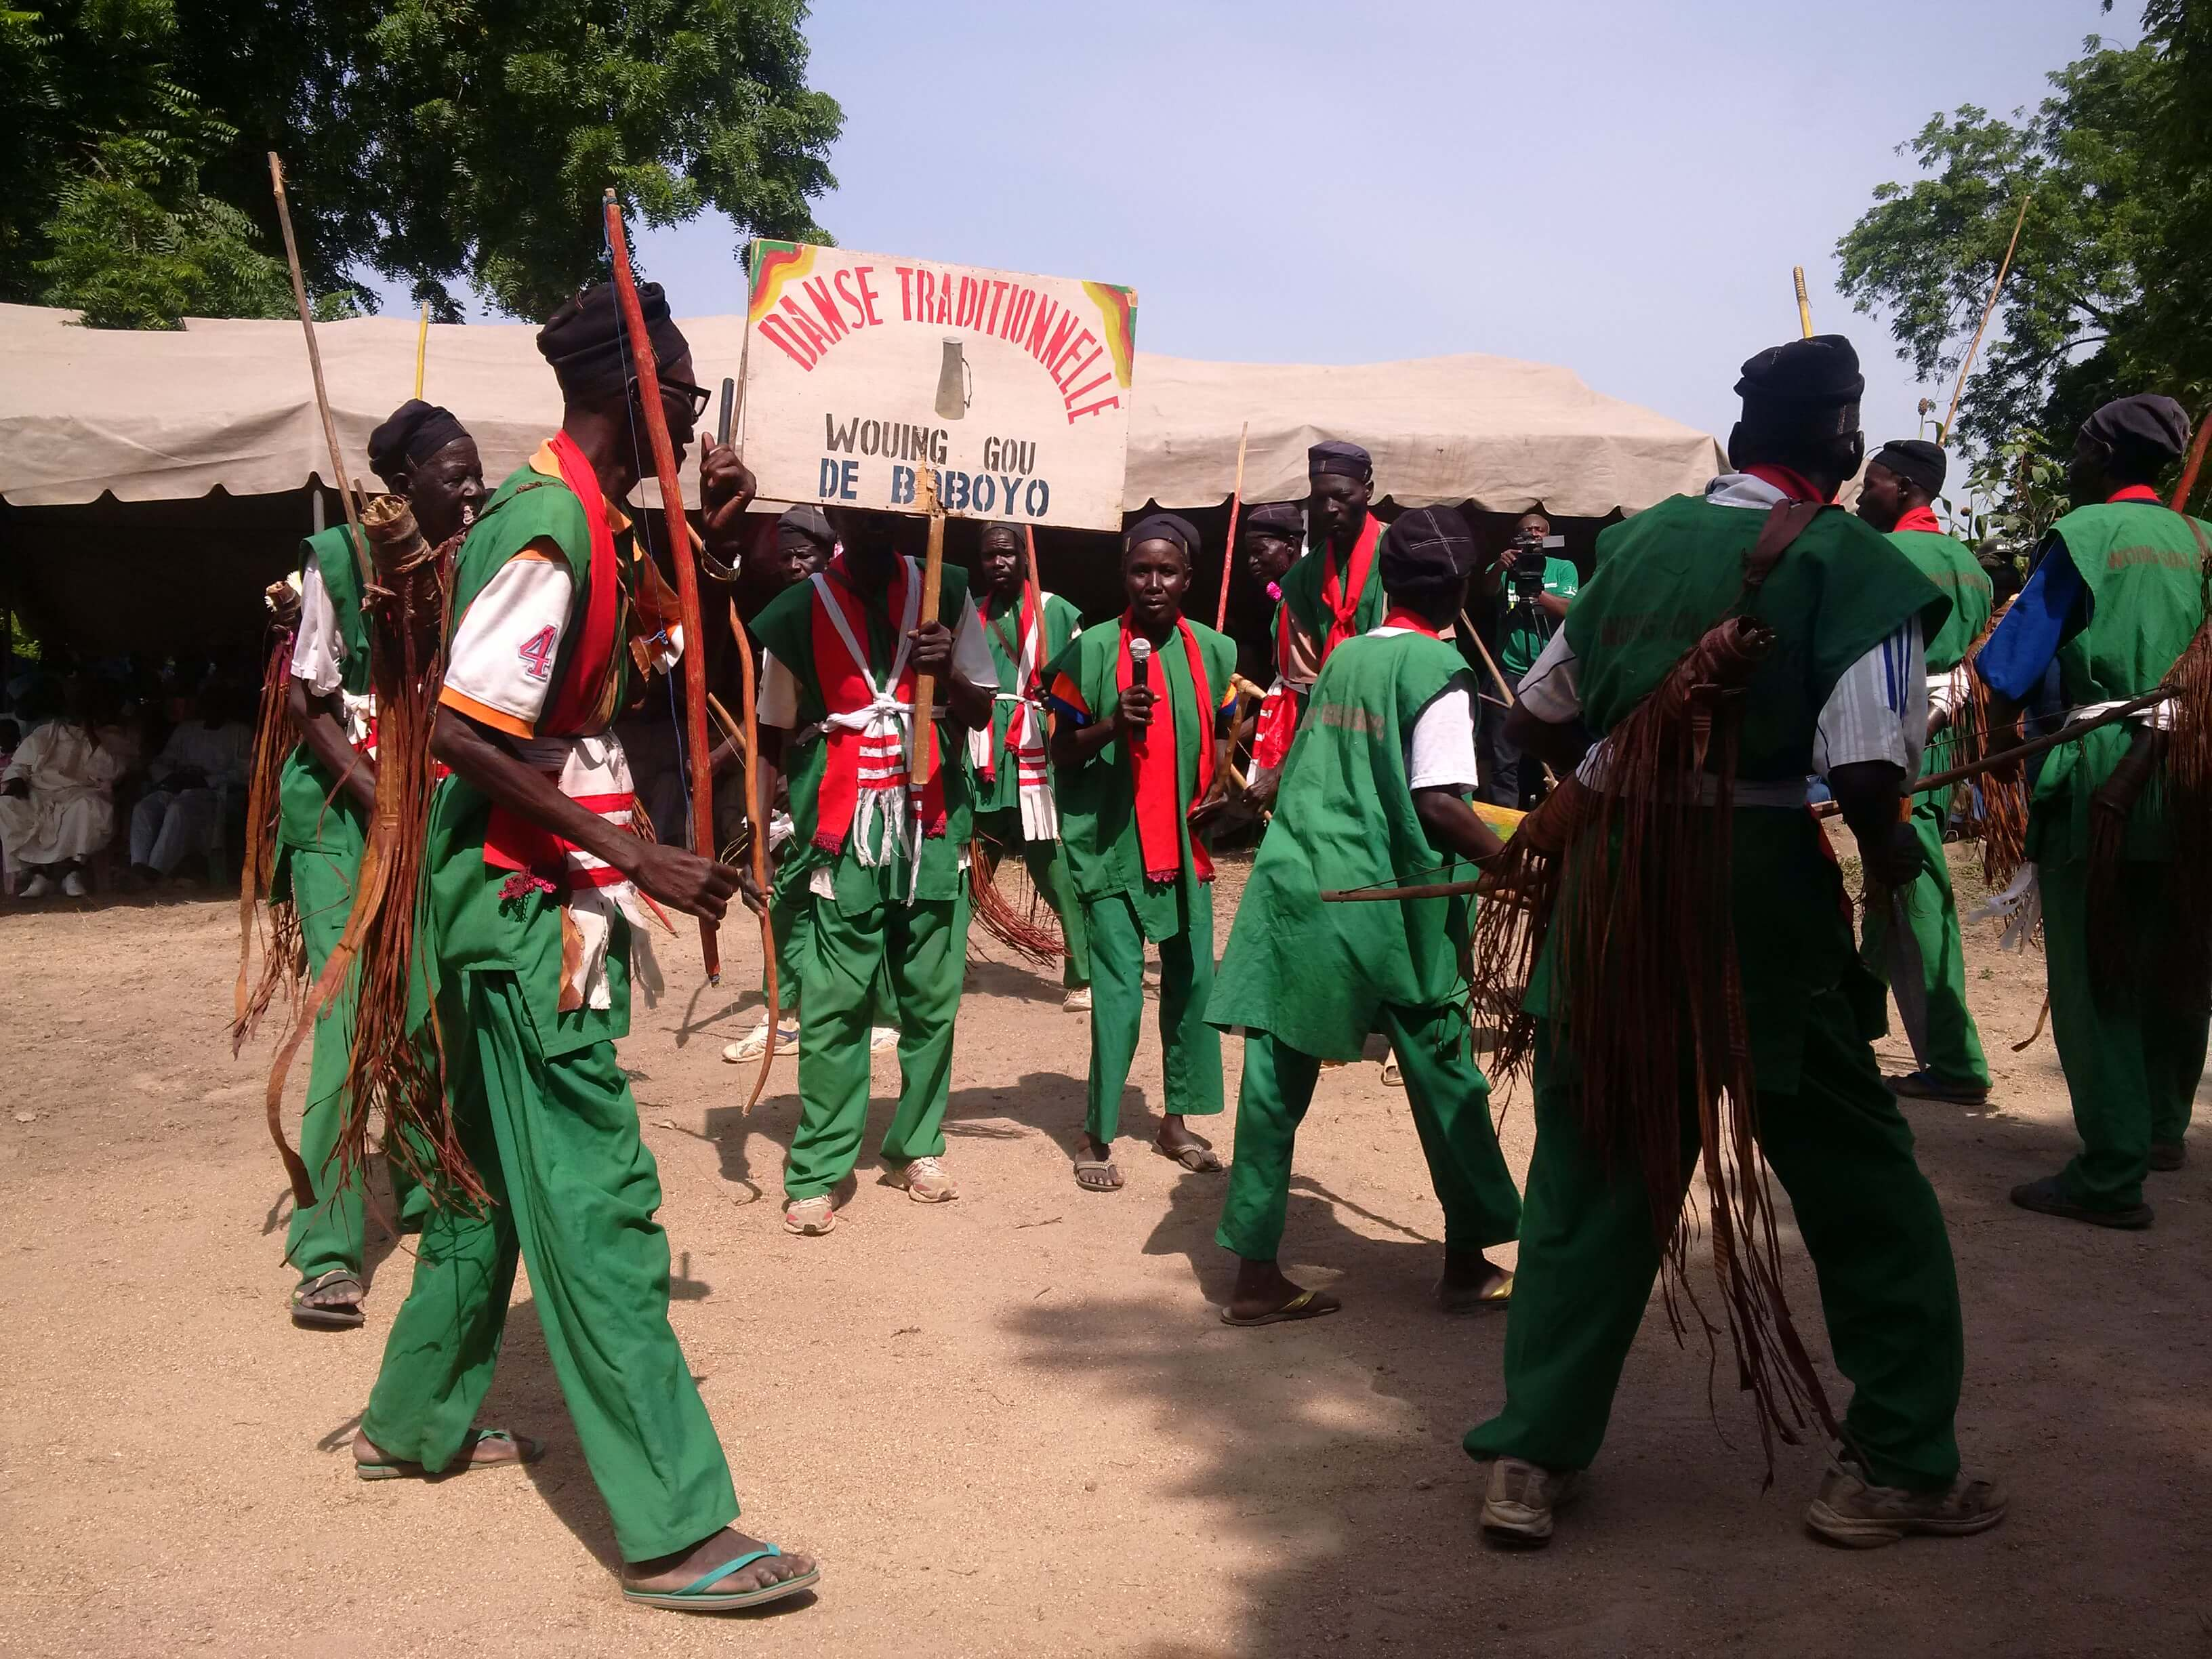 Nooke in Boboyo, Traditioneller Tanz, Extremer Norden Kamerun